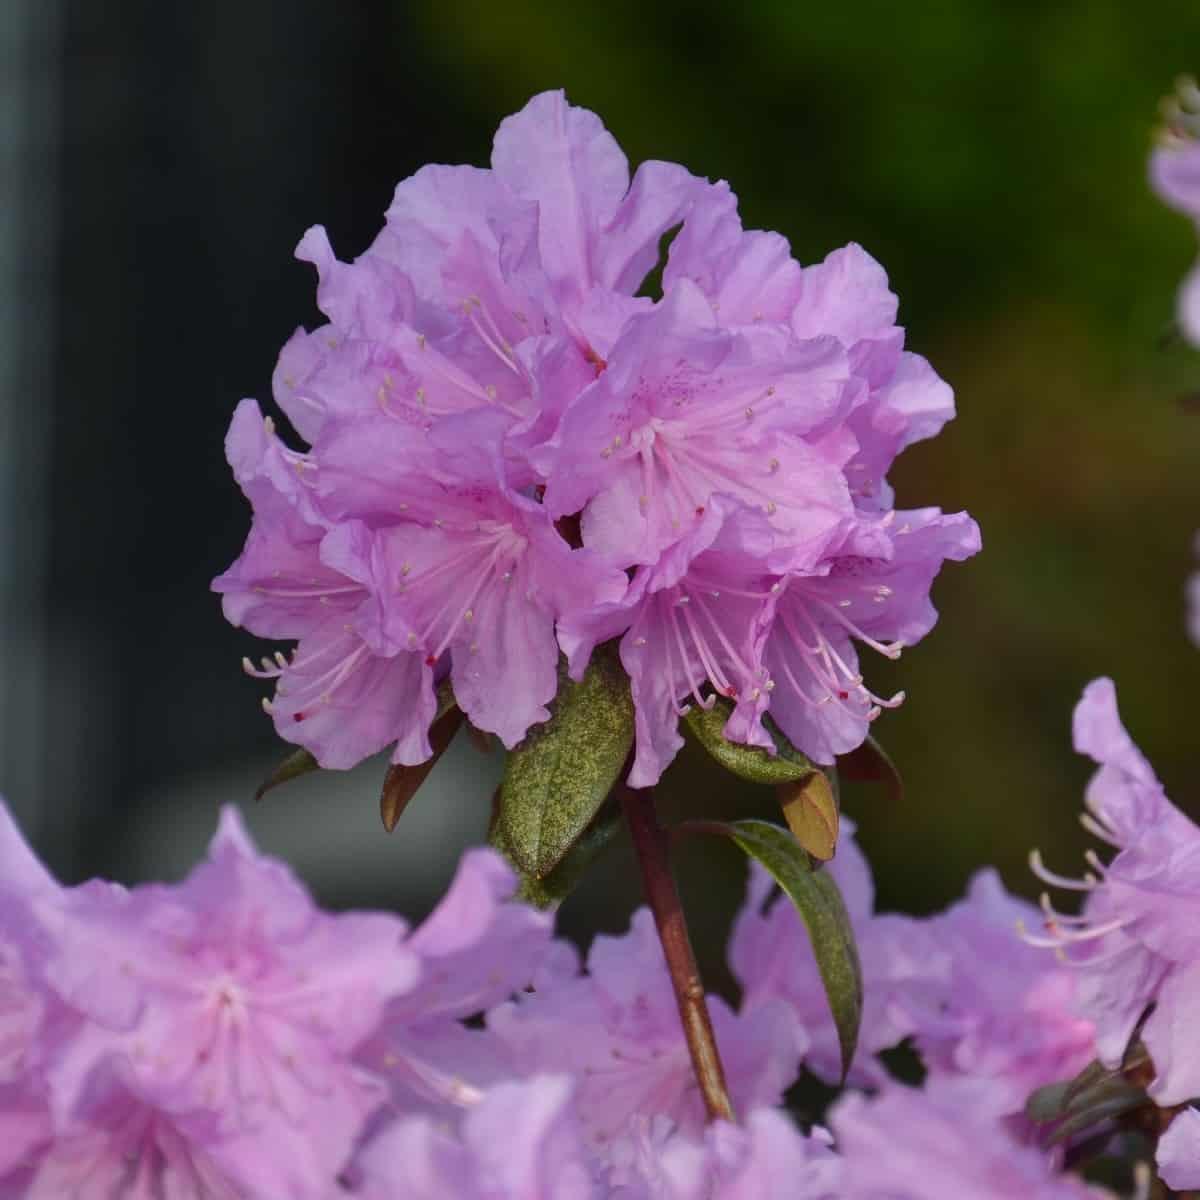 The PJM elite rhododendron sports reddish-purple leaves in winter.